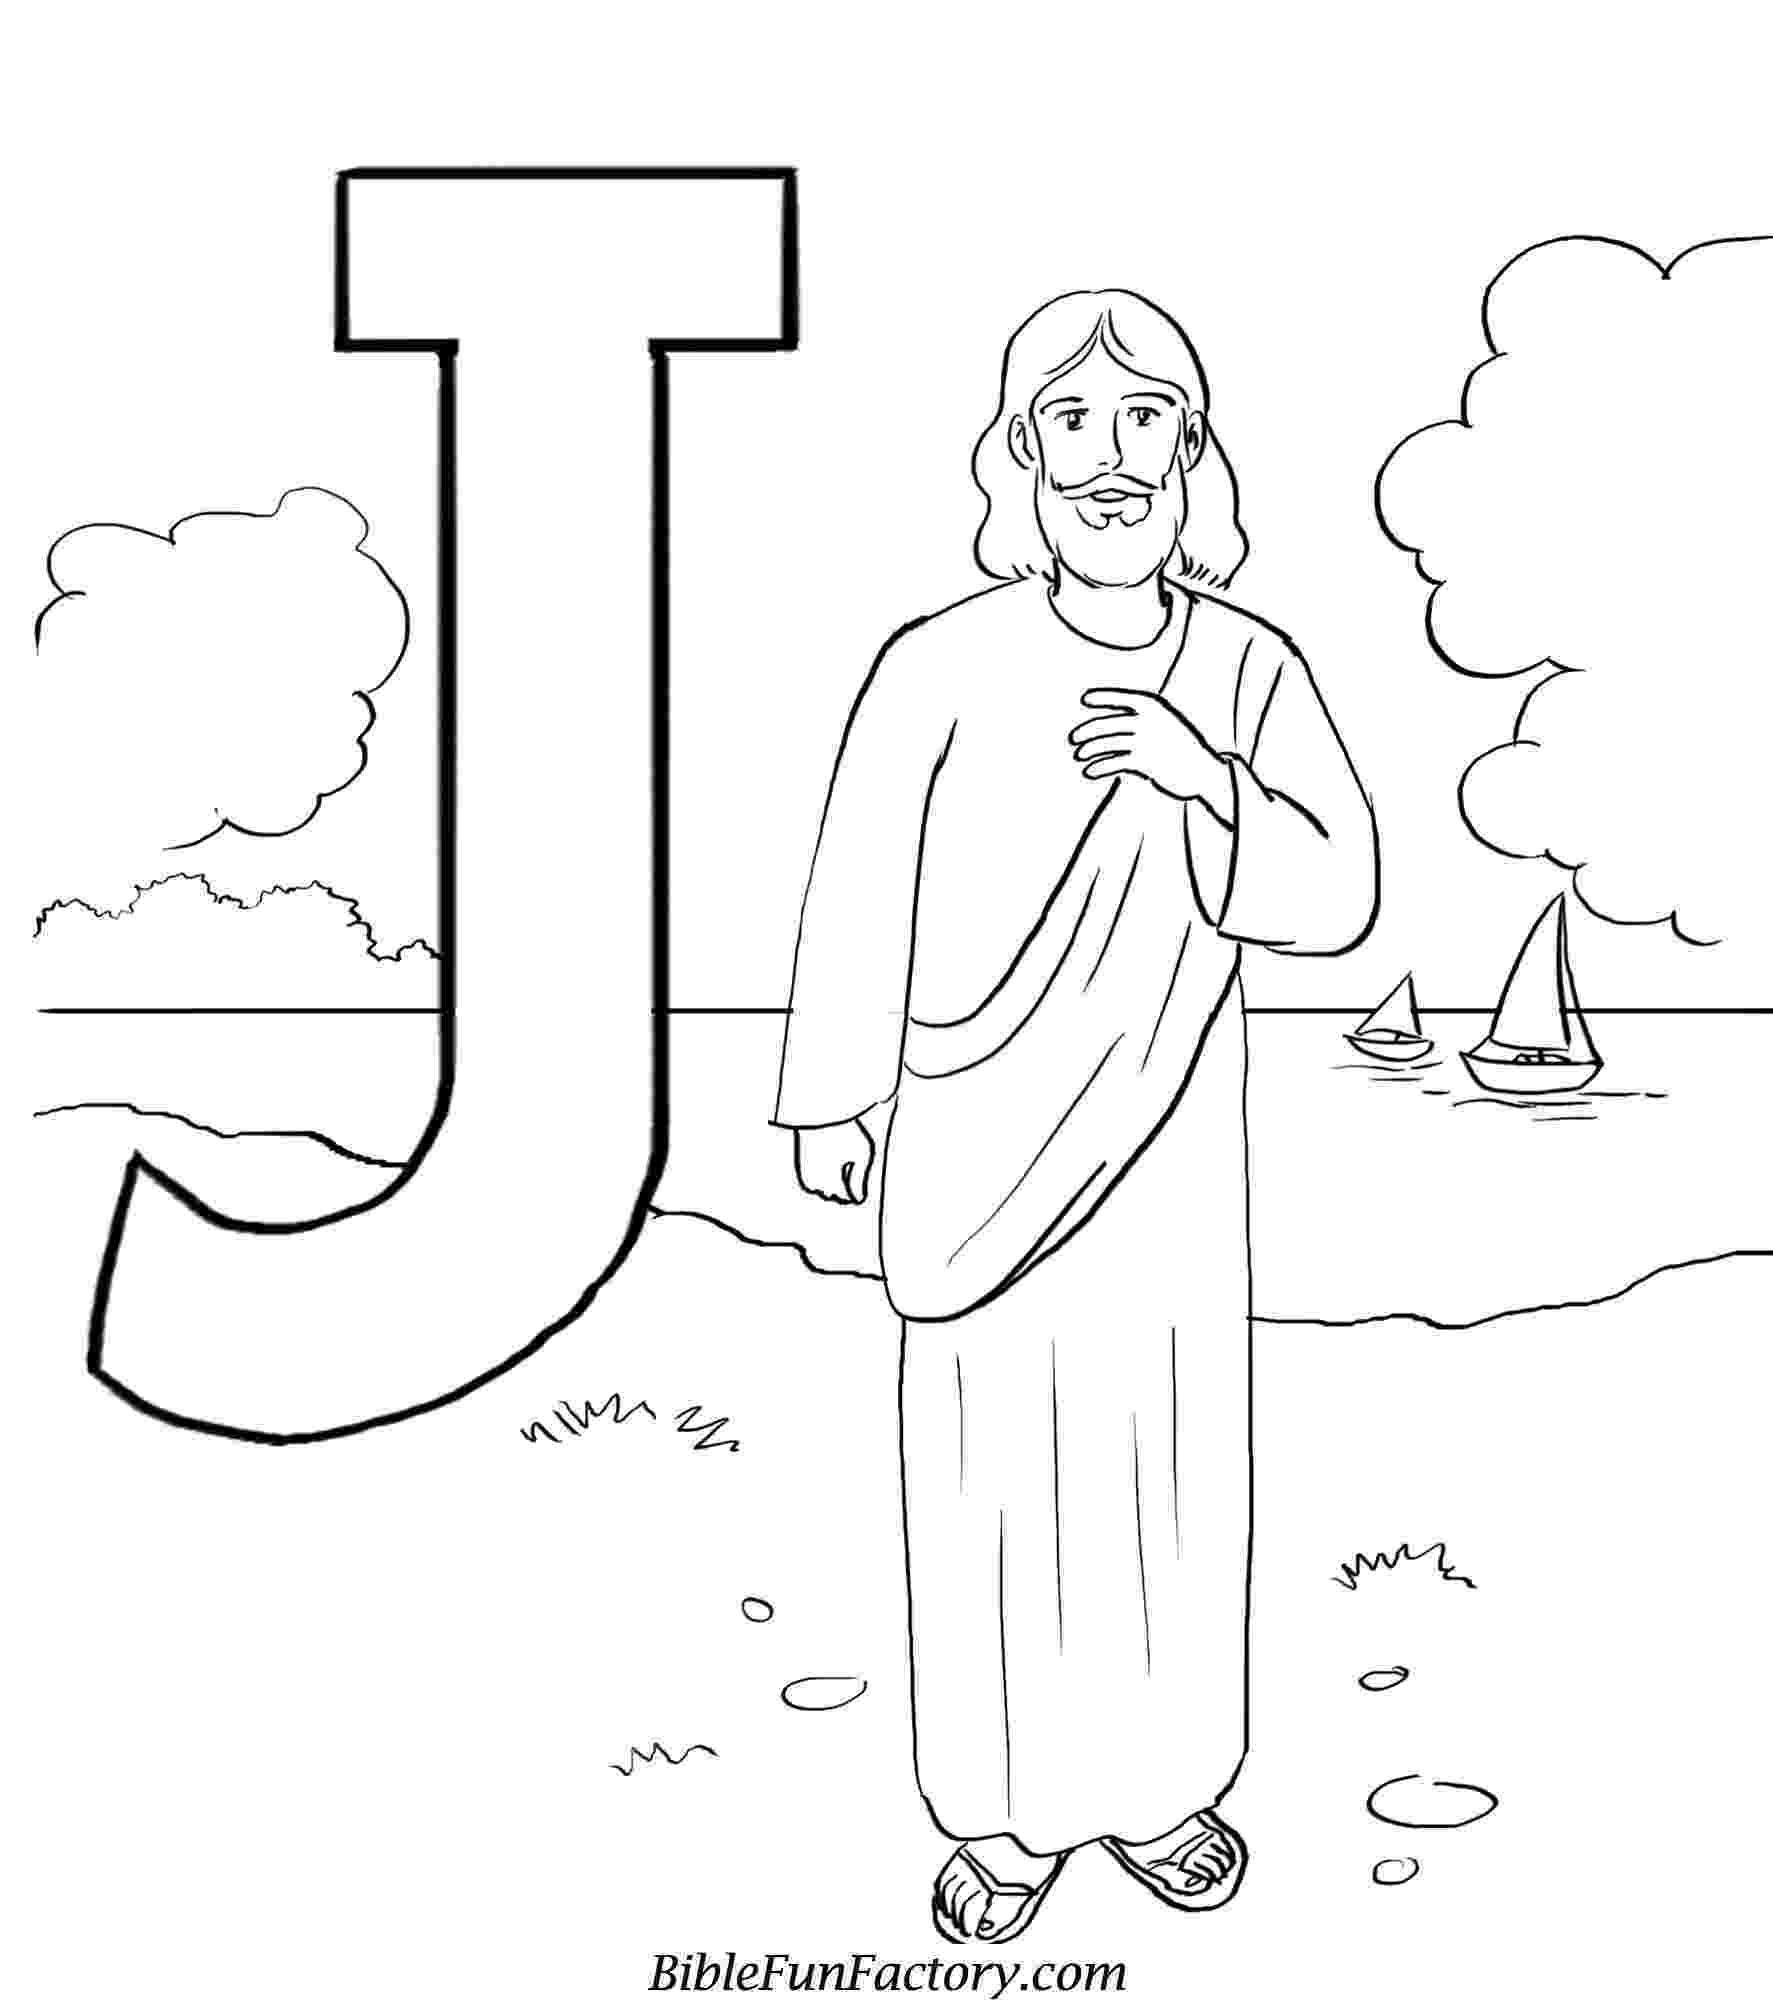 coloring sheet of jesus simple pencil of jesus coloring pages sheet of jesus coloring